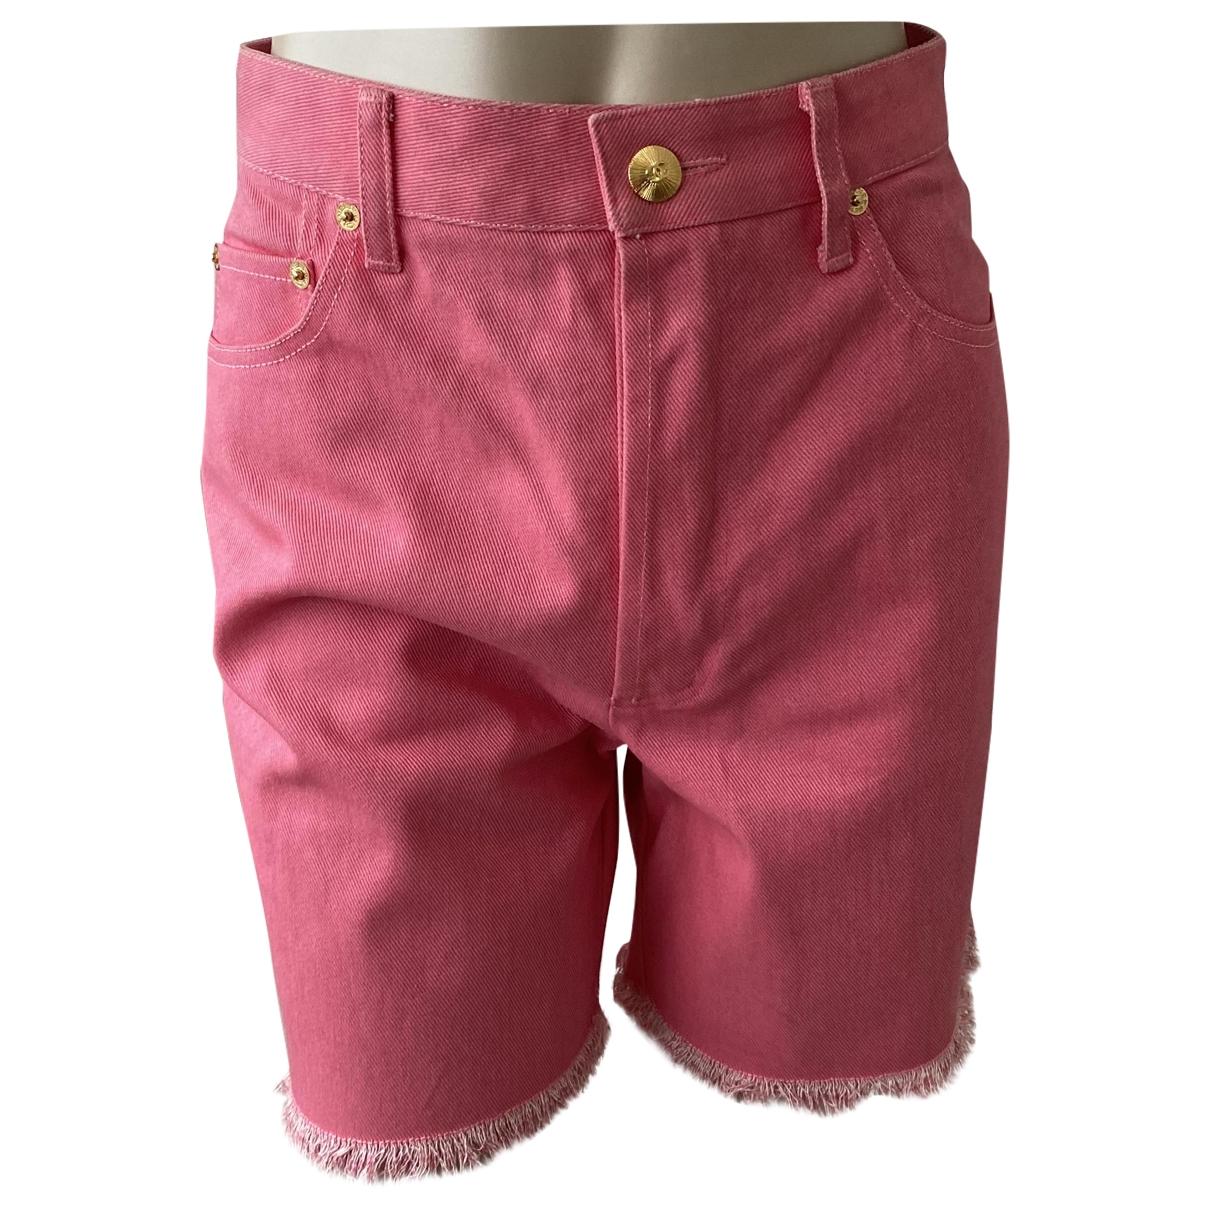 Chanel \N Shorts in  Rosa Baumwolle